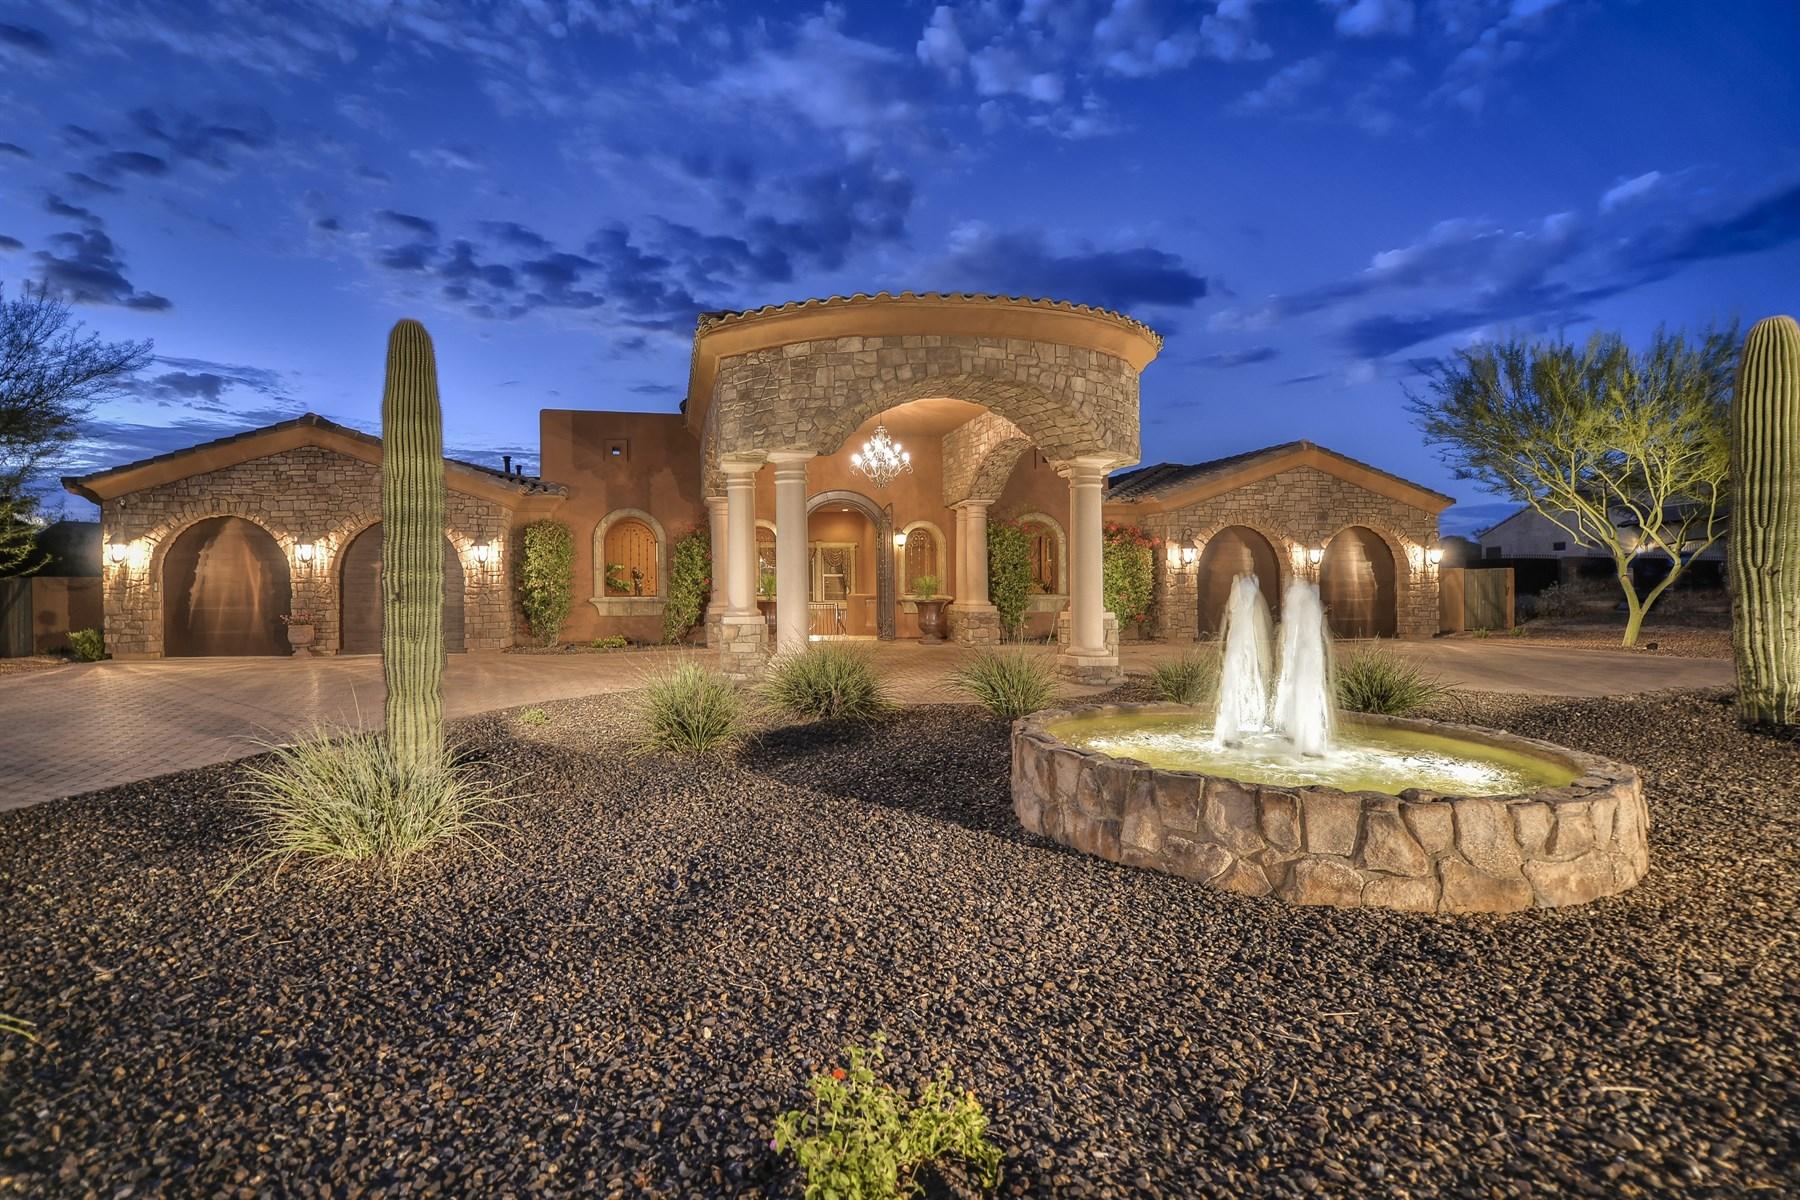 Moradia para Venda às Beautiful Mediterranean style home 8214 E Kael St Mesa, Arizona, 85207 Estados Unidos